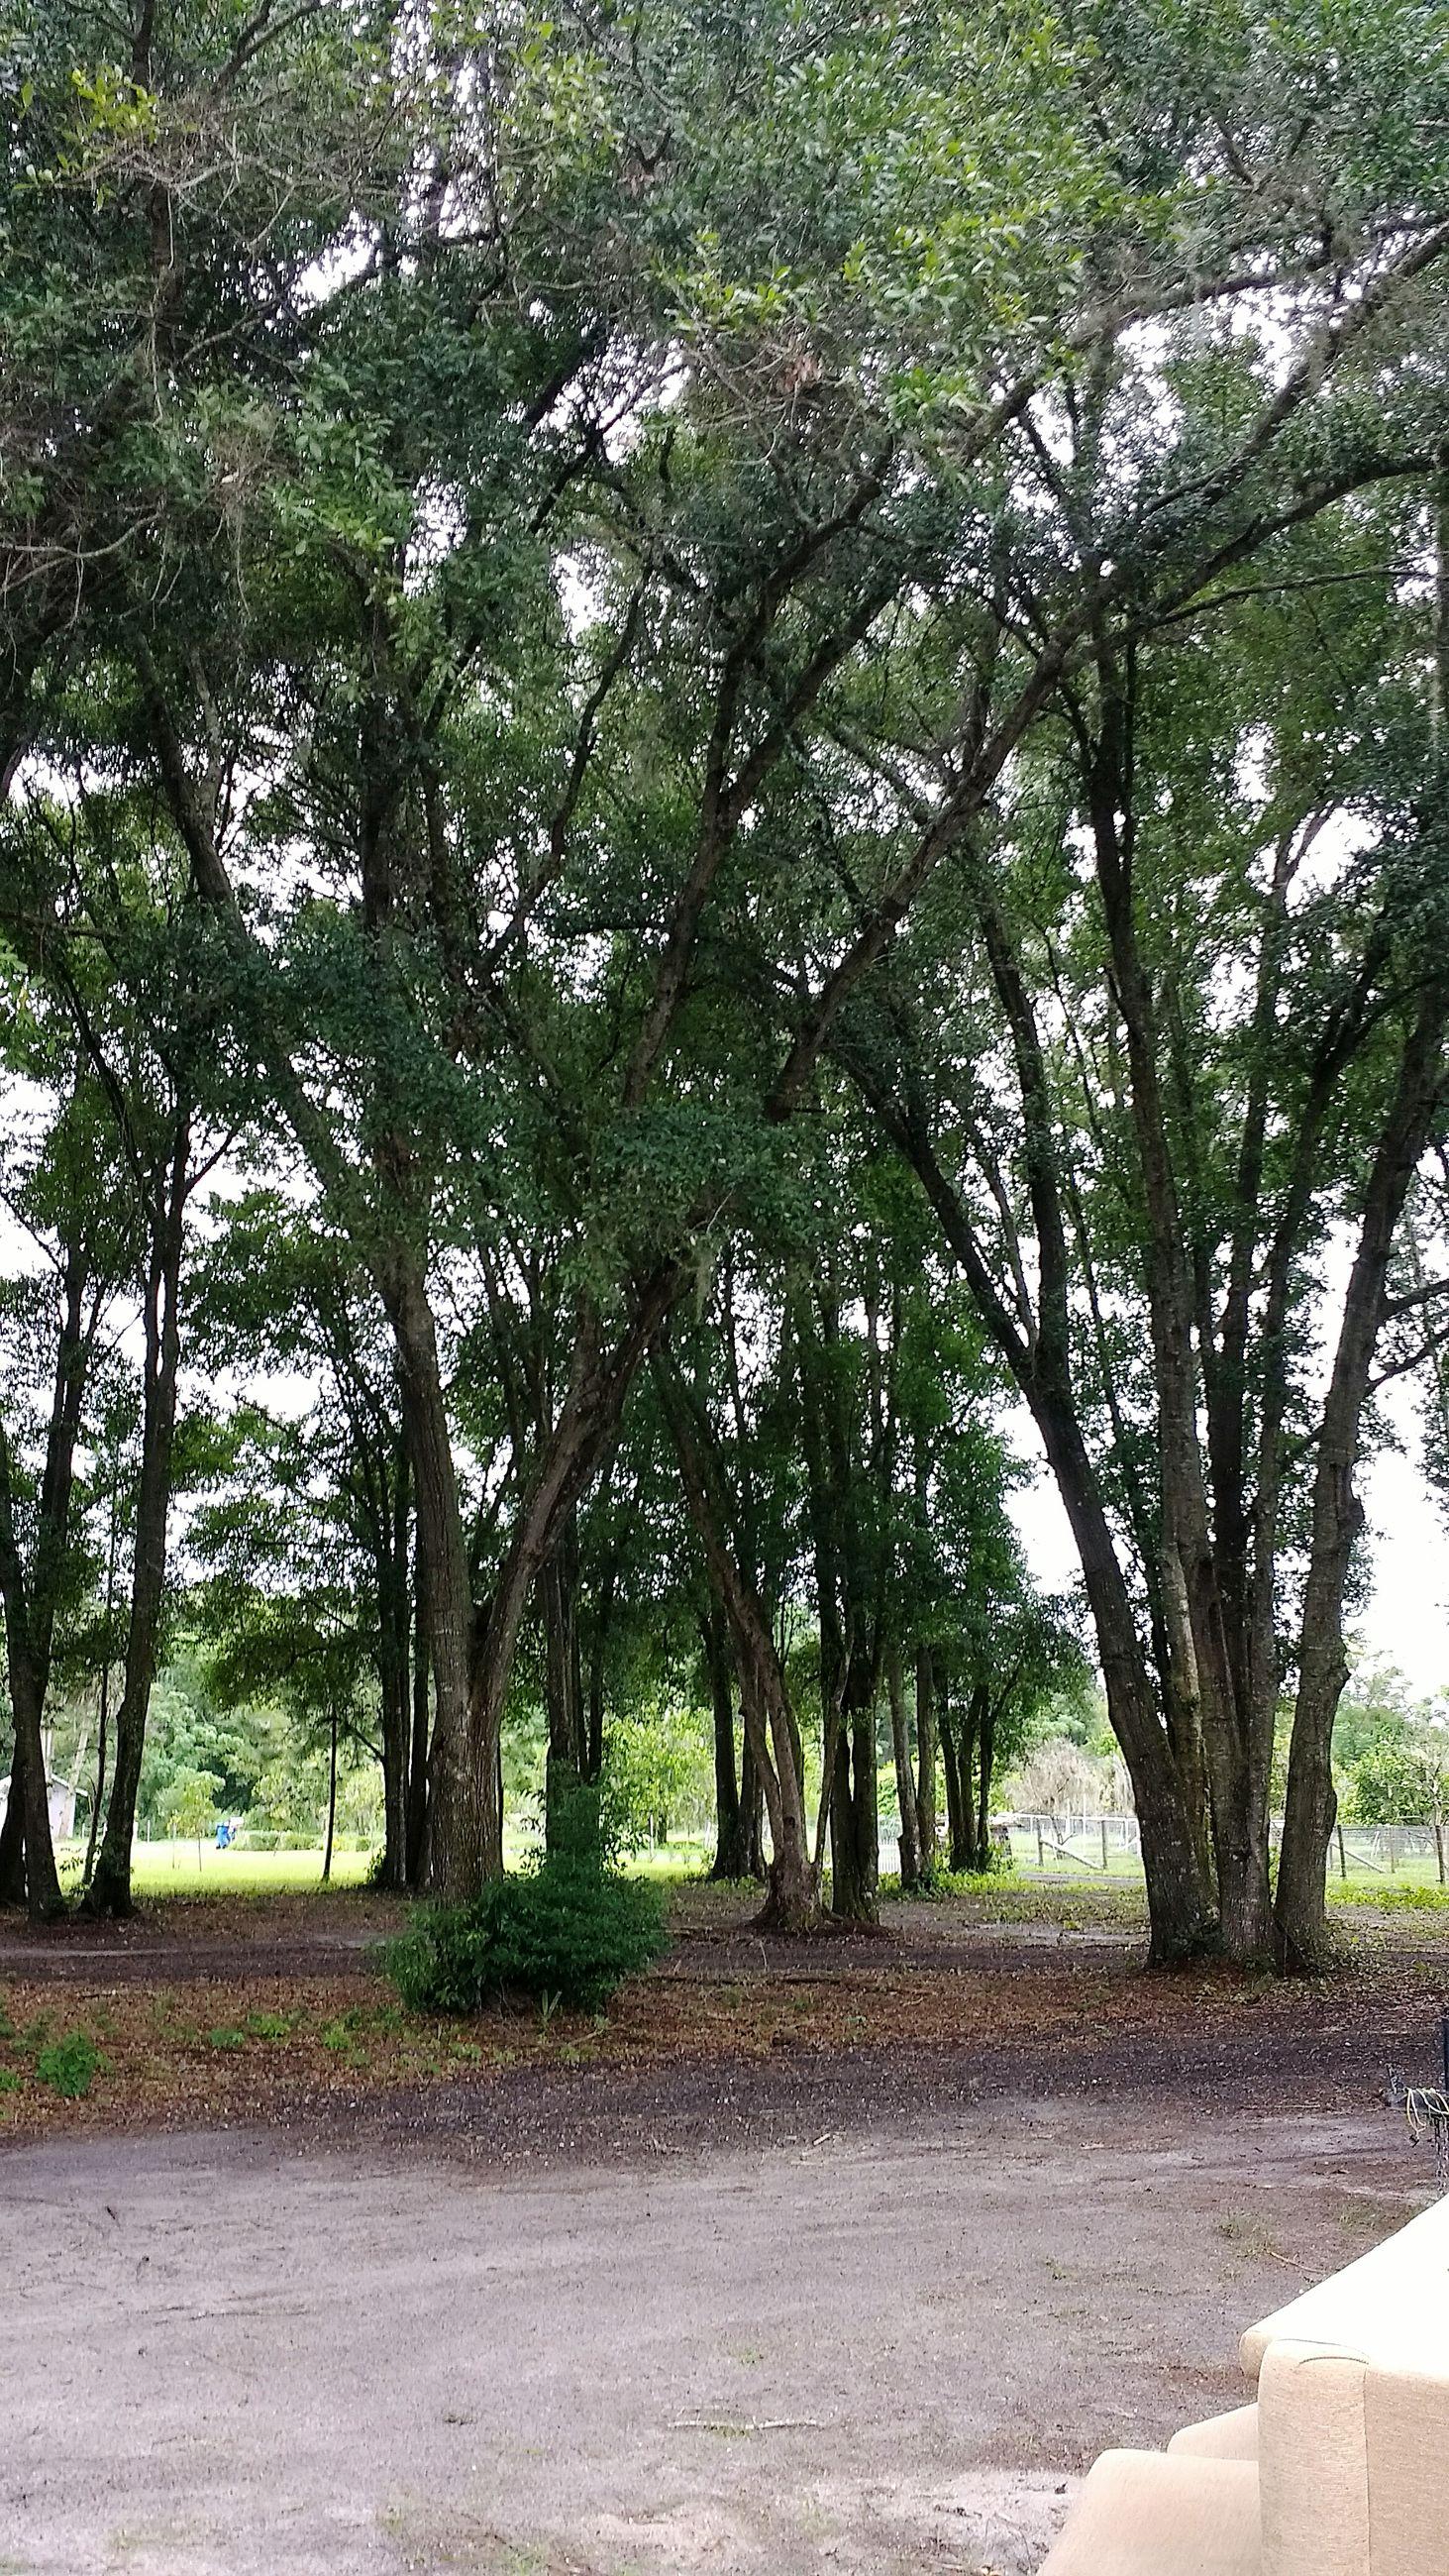 TREES ON ROAD ALONG LANDSCAPE